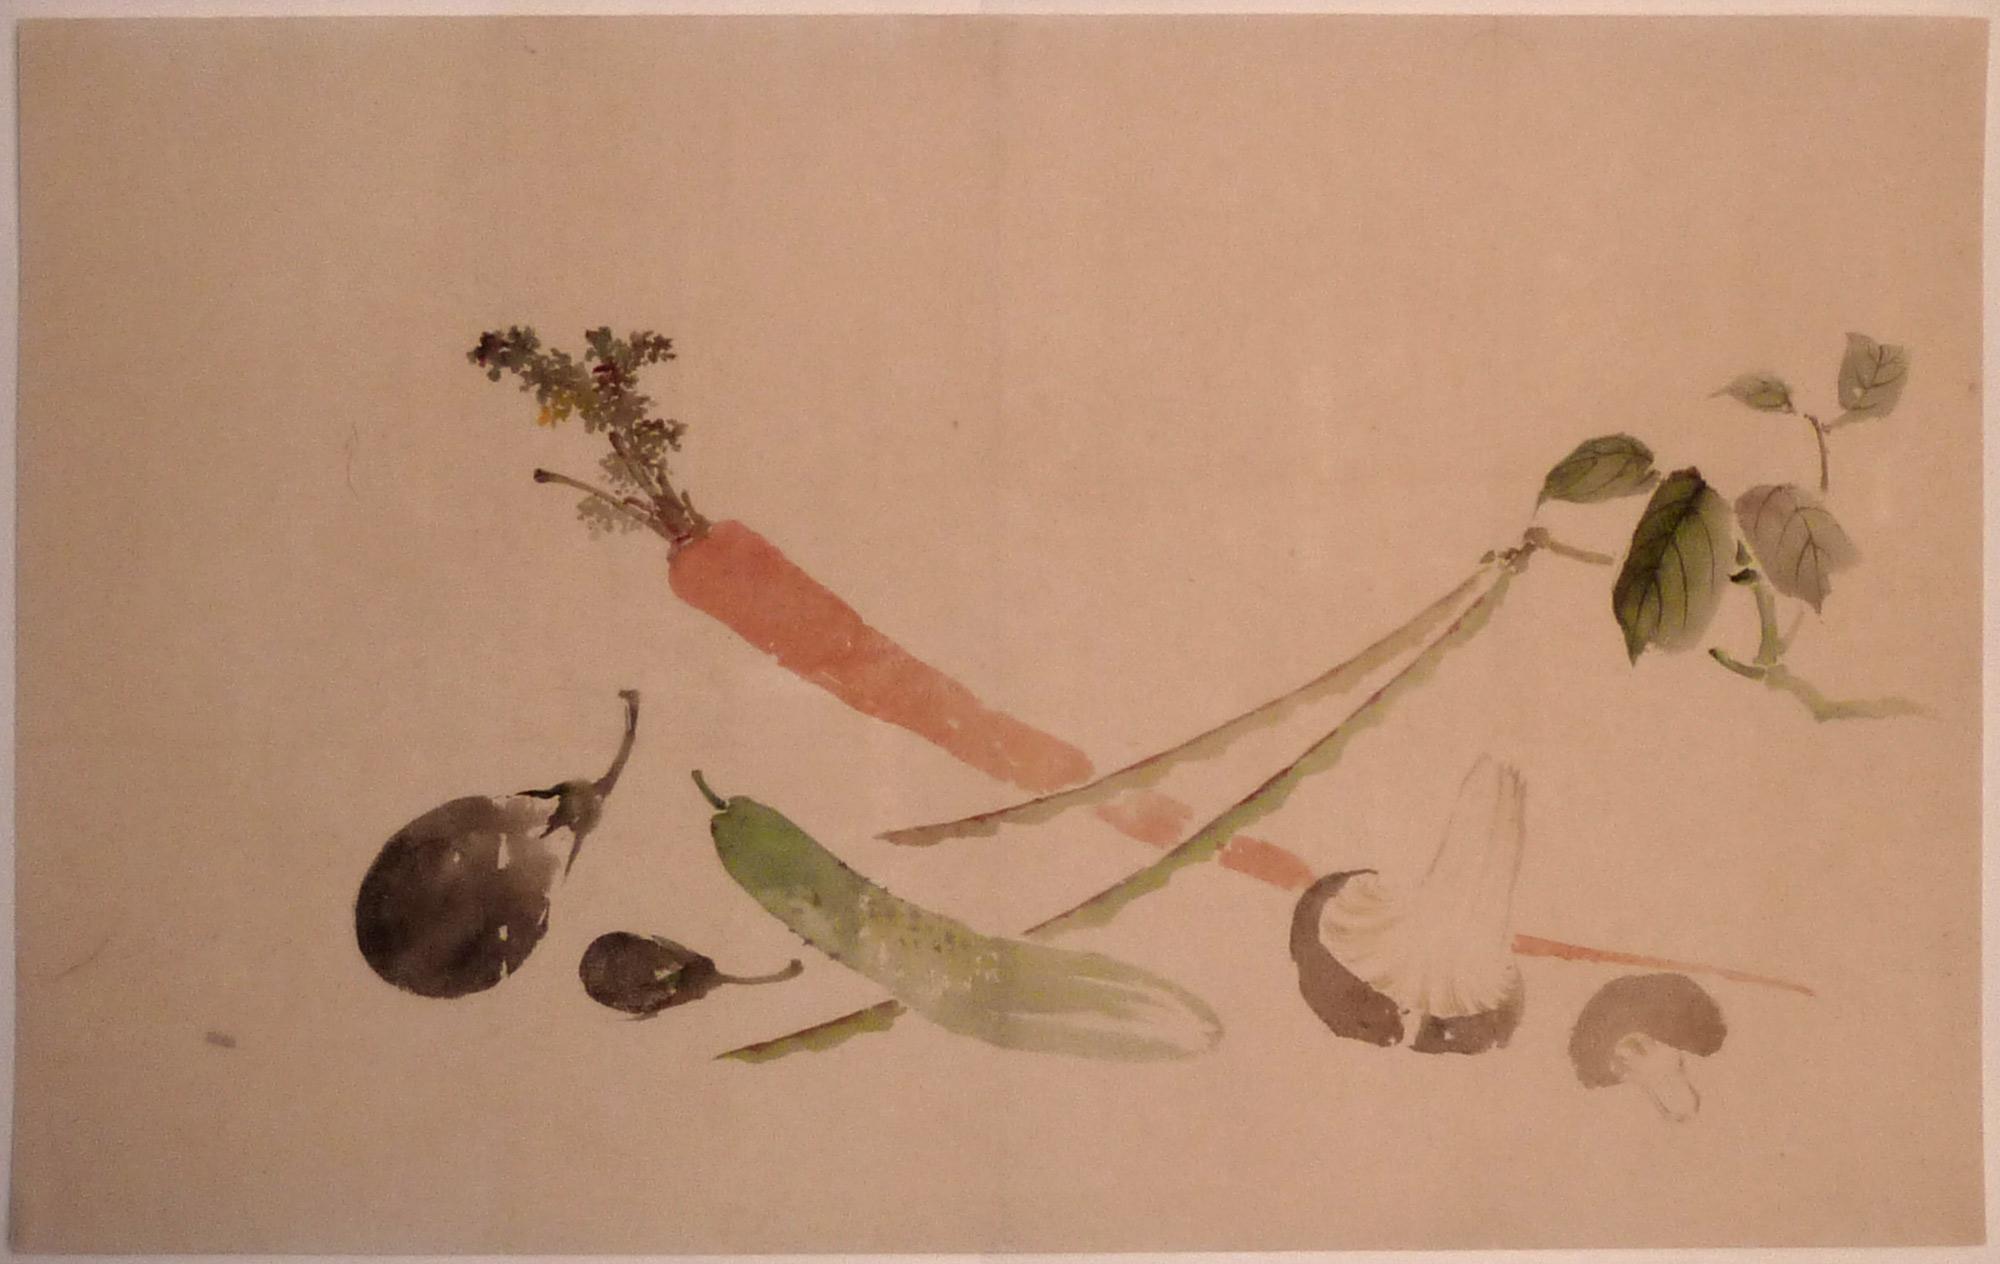 http://www.japaneseprints-london.com/ukiyoe/images/Katsushika-HOKUSAI-1760-1849-paintings50.jpg